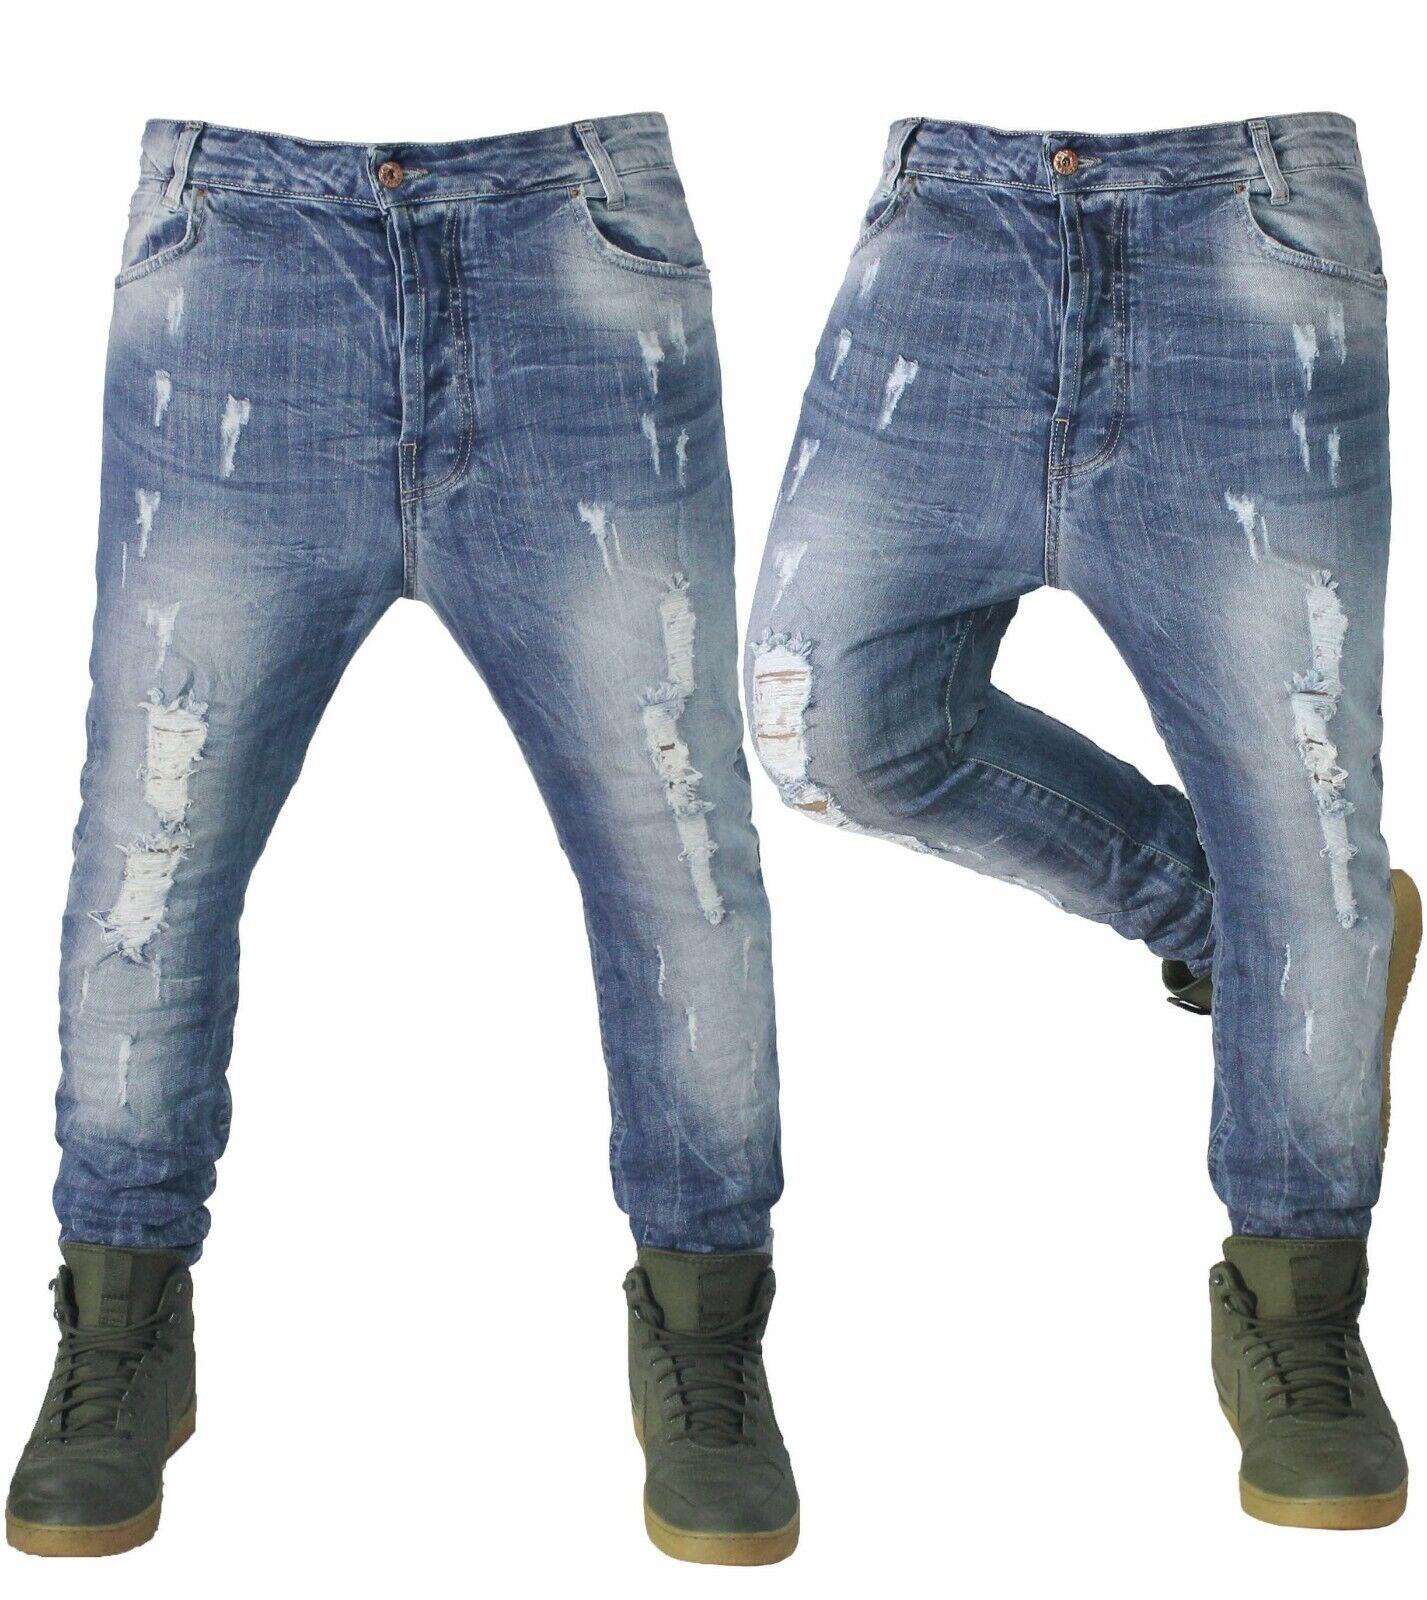 Pantaloni Klixs Jeans Uomo Cavallo Basso Vita Bassa Slim Fit Varianti Colori